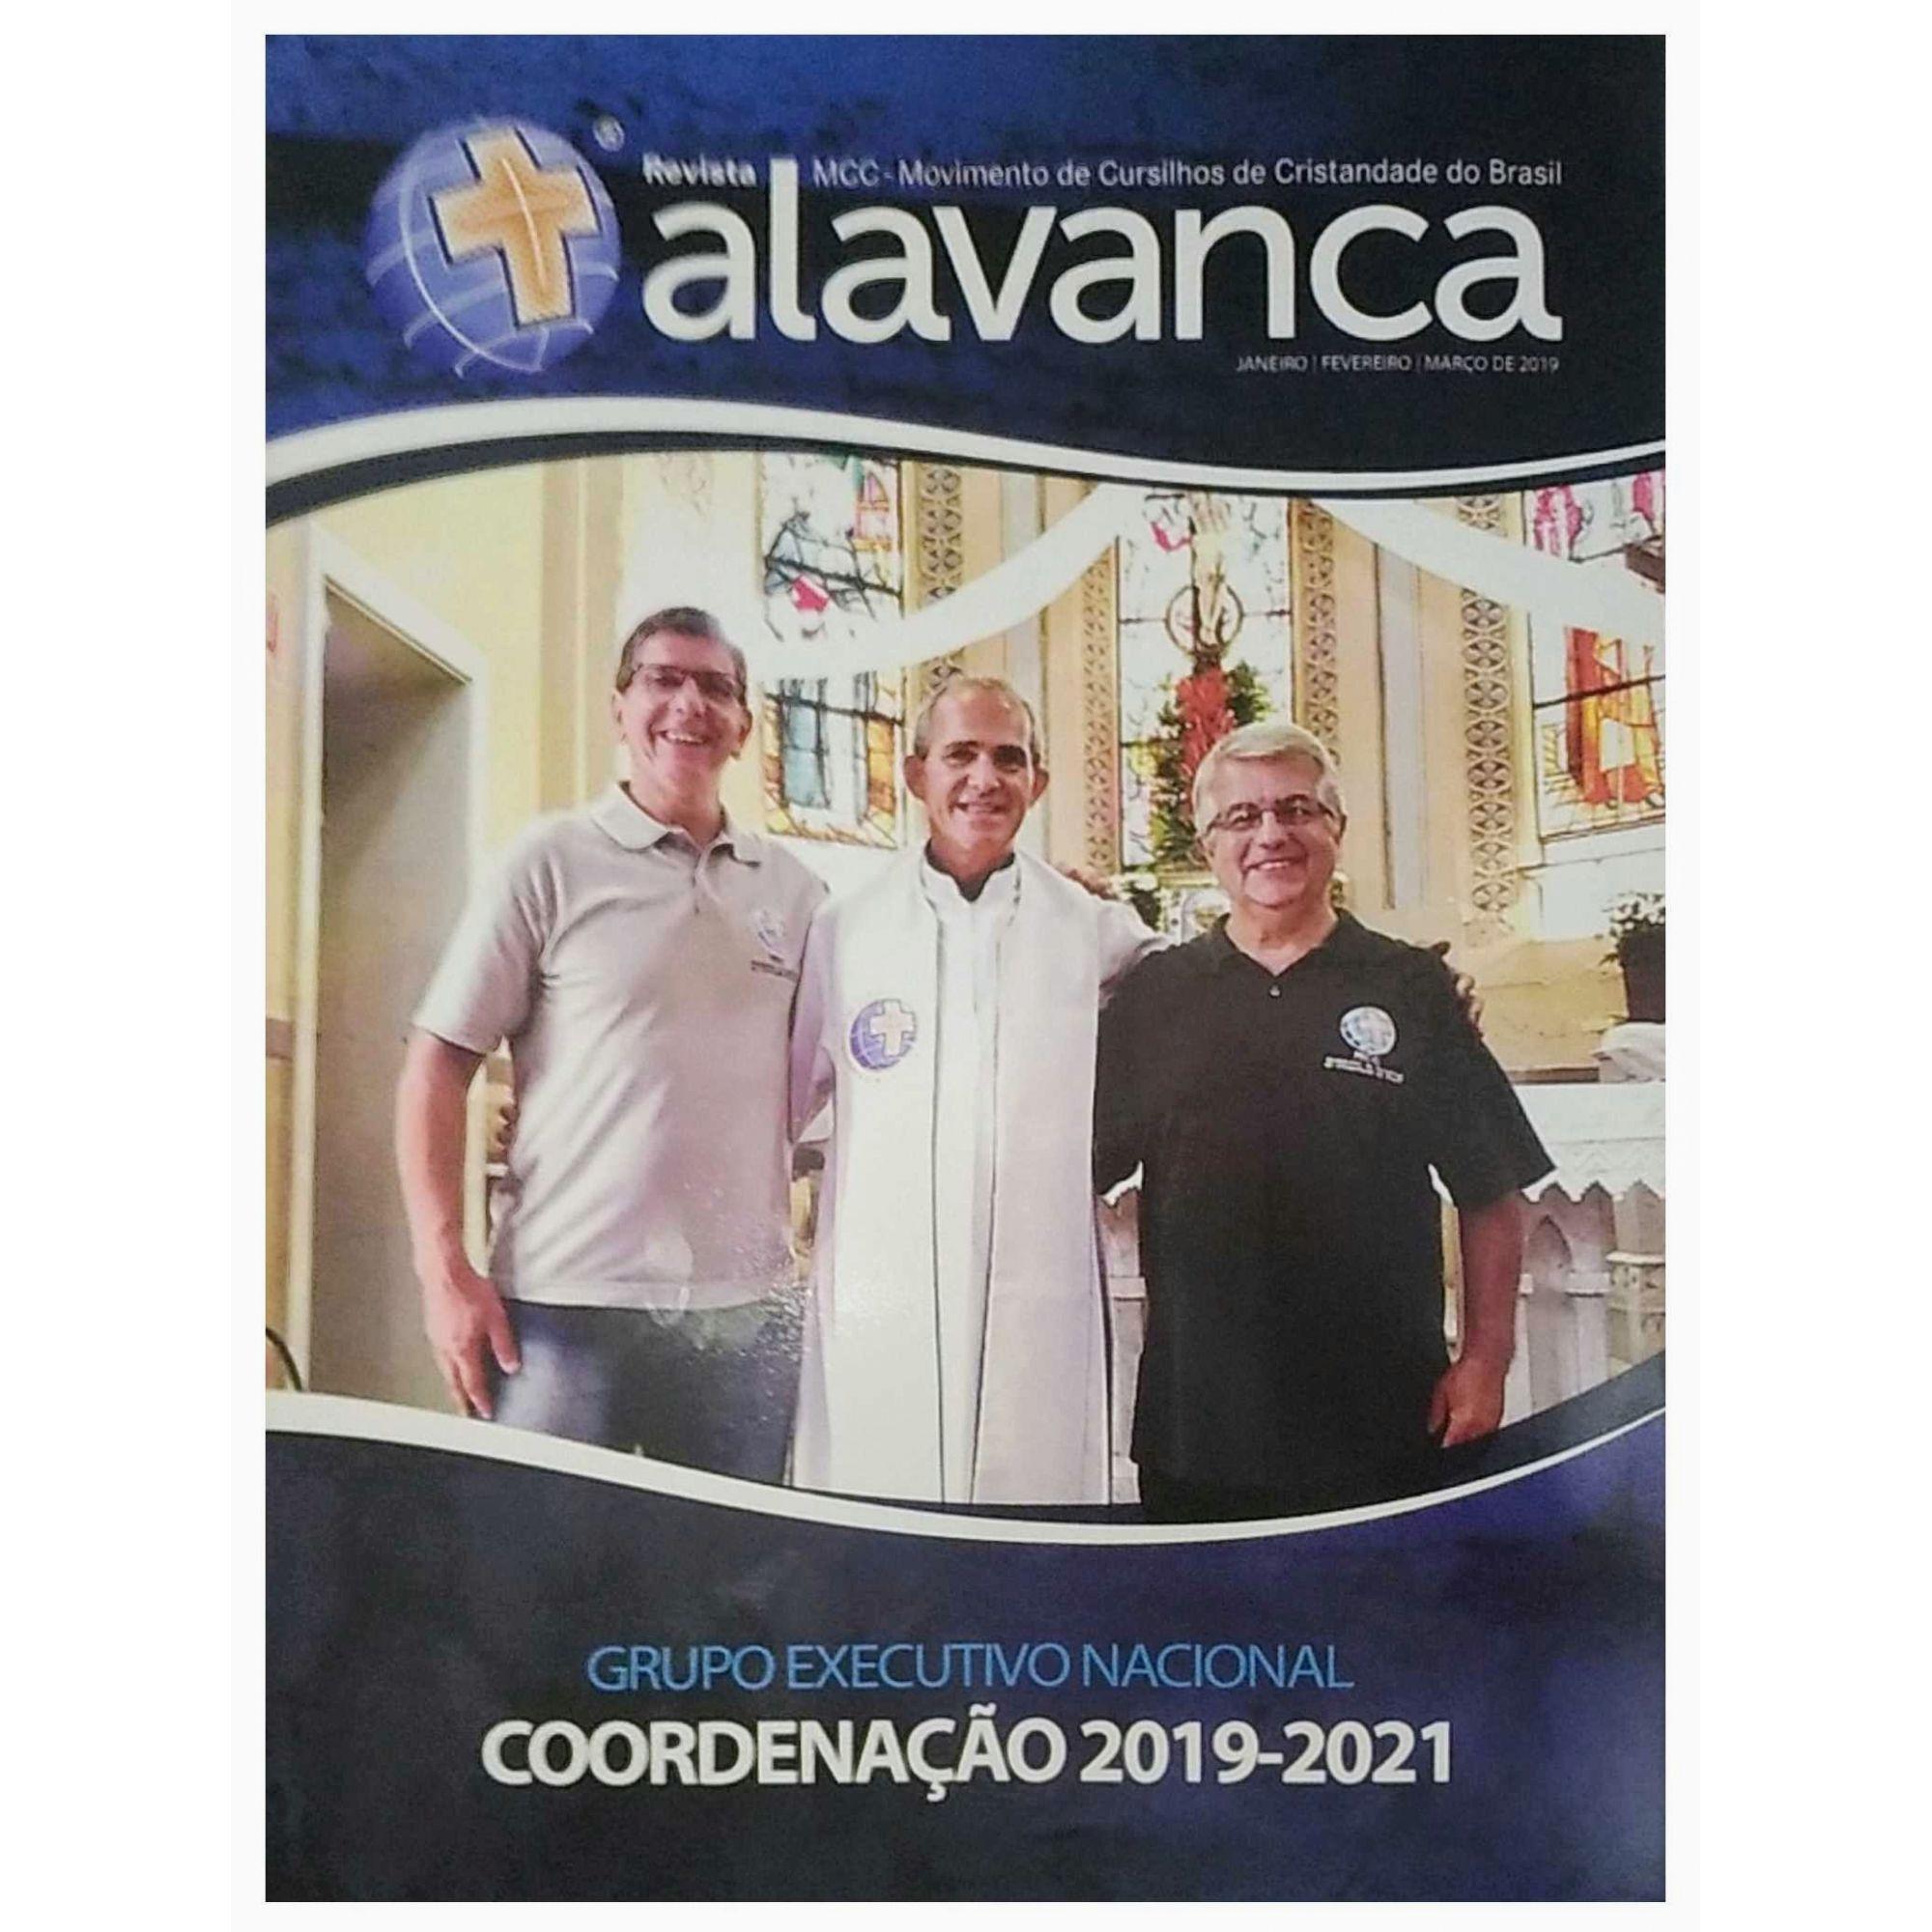 Revista Alavanca - Assinatura Anual  - Cursilho